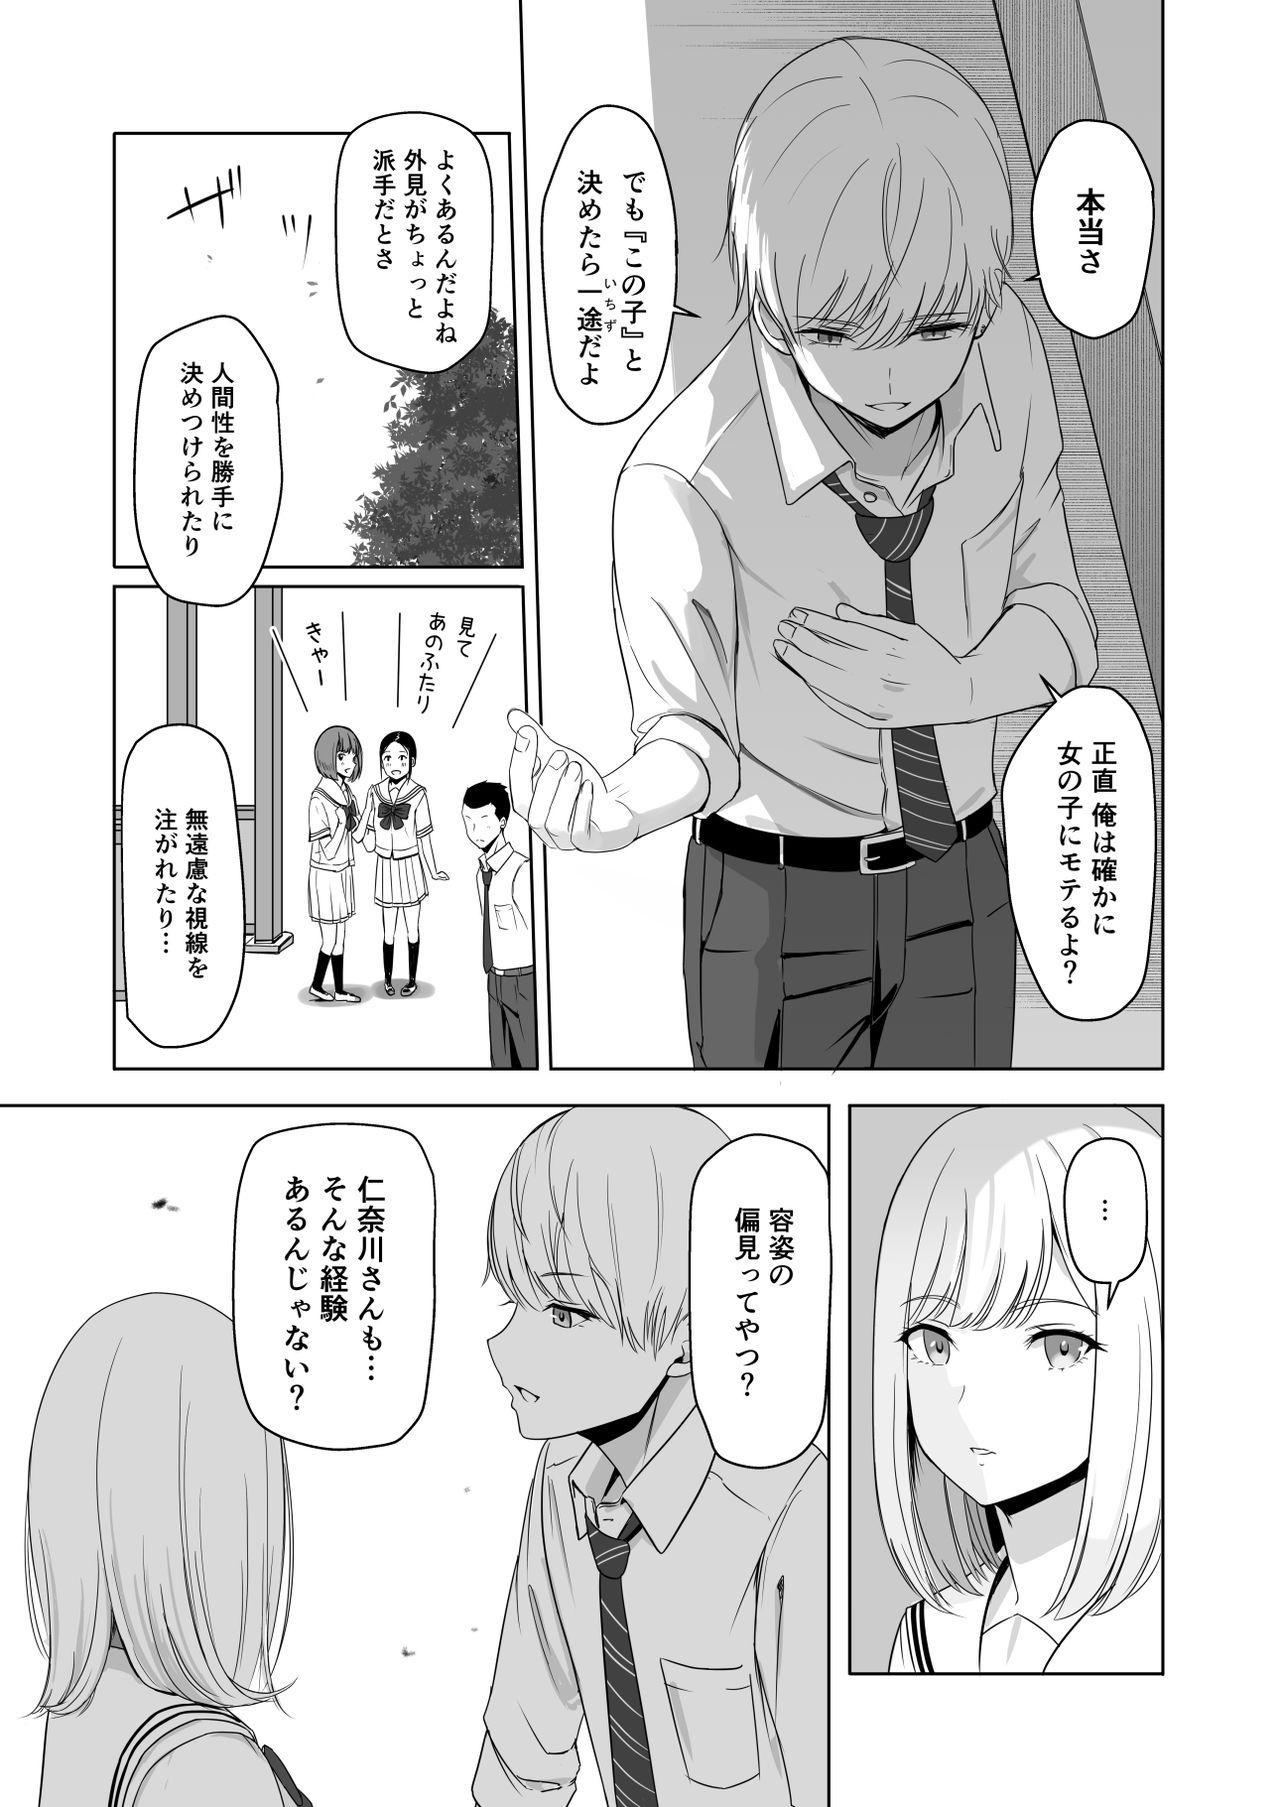 Kimi ga Tame. 2 Ichikawa Inori 27